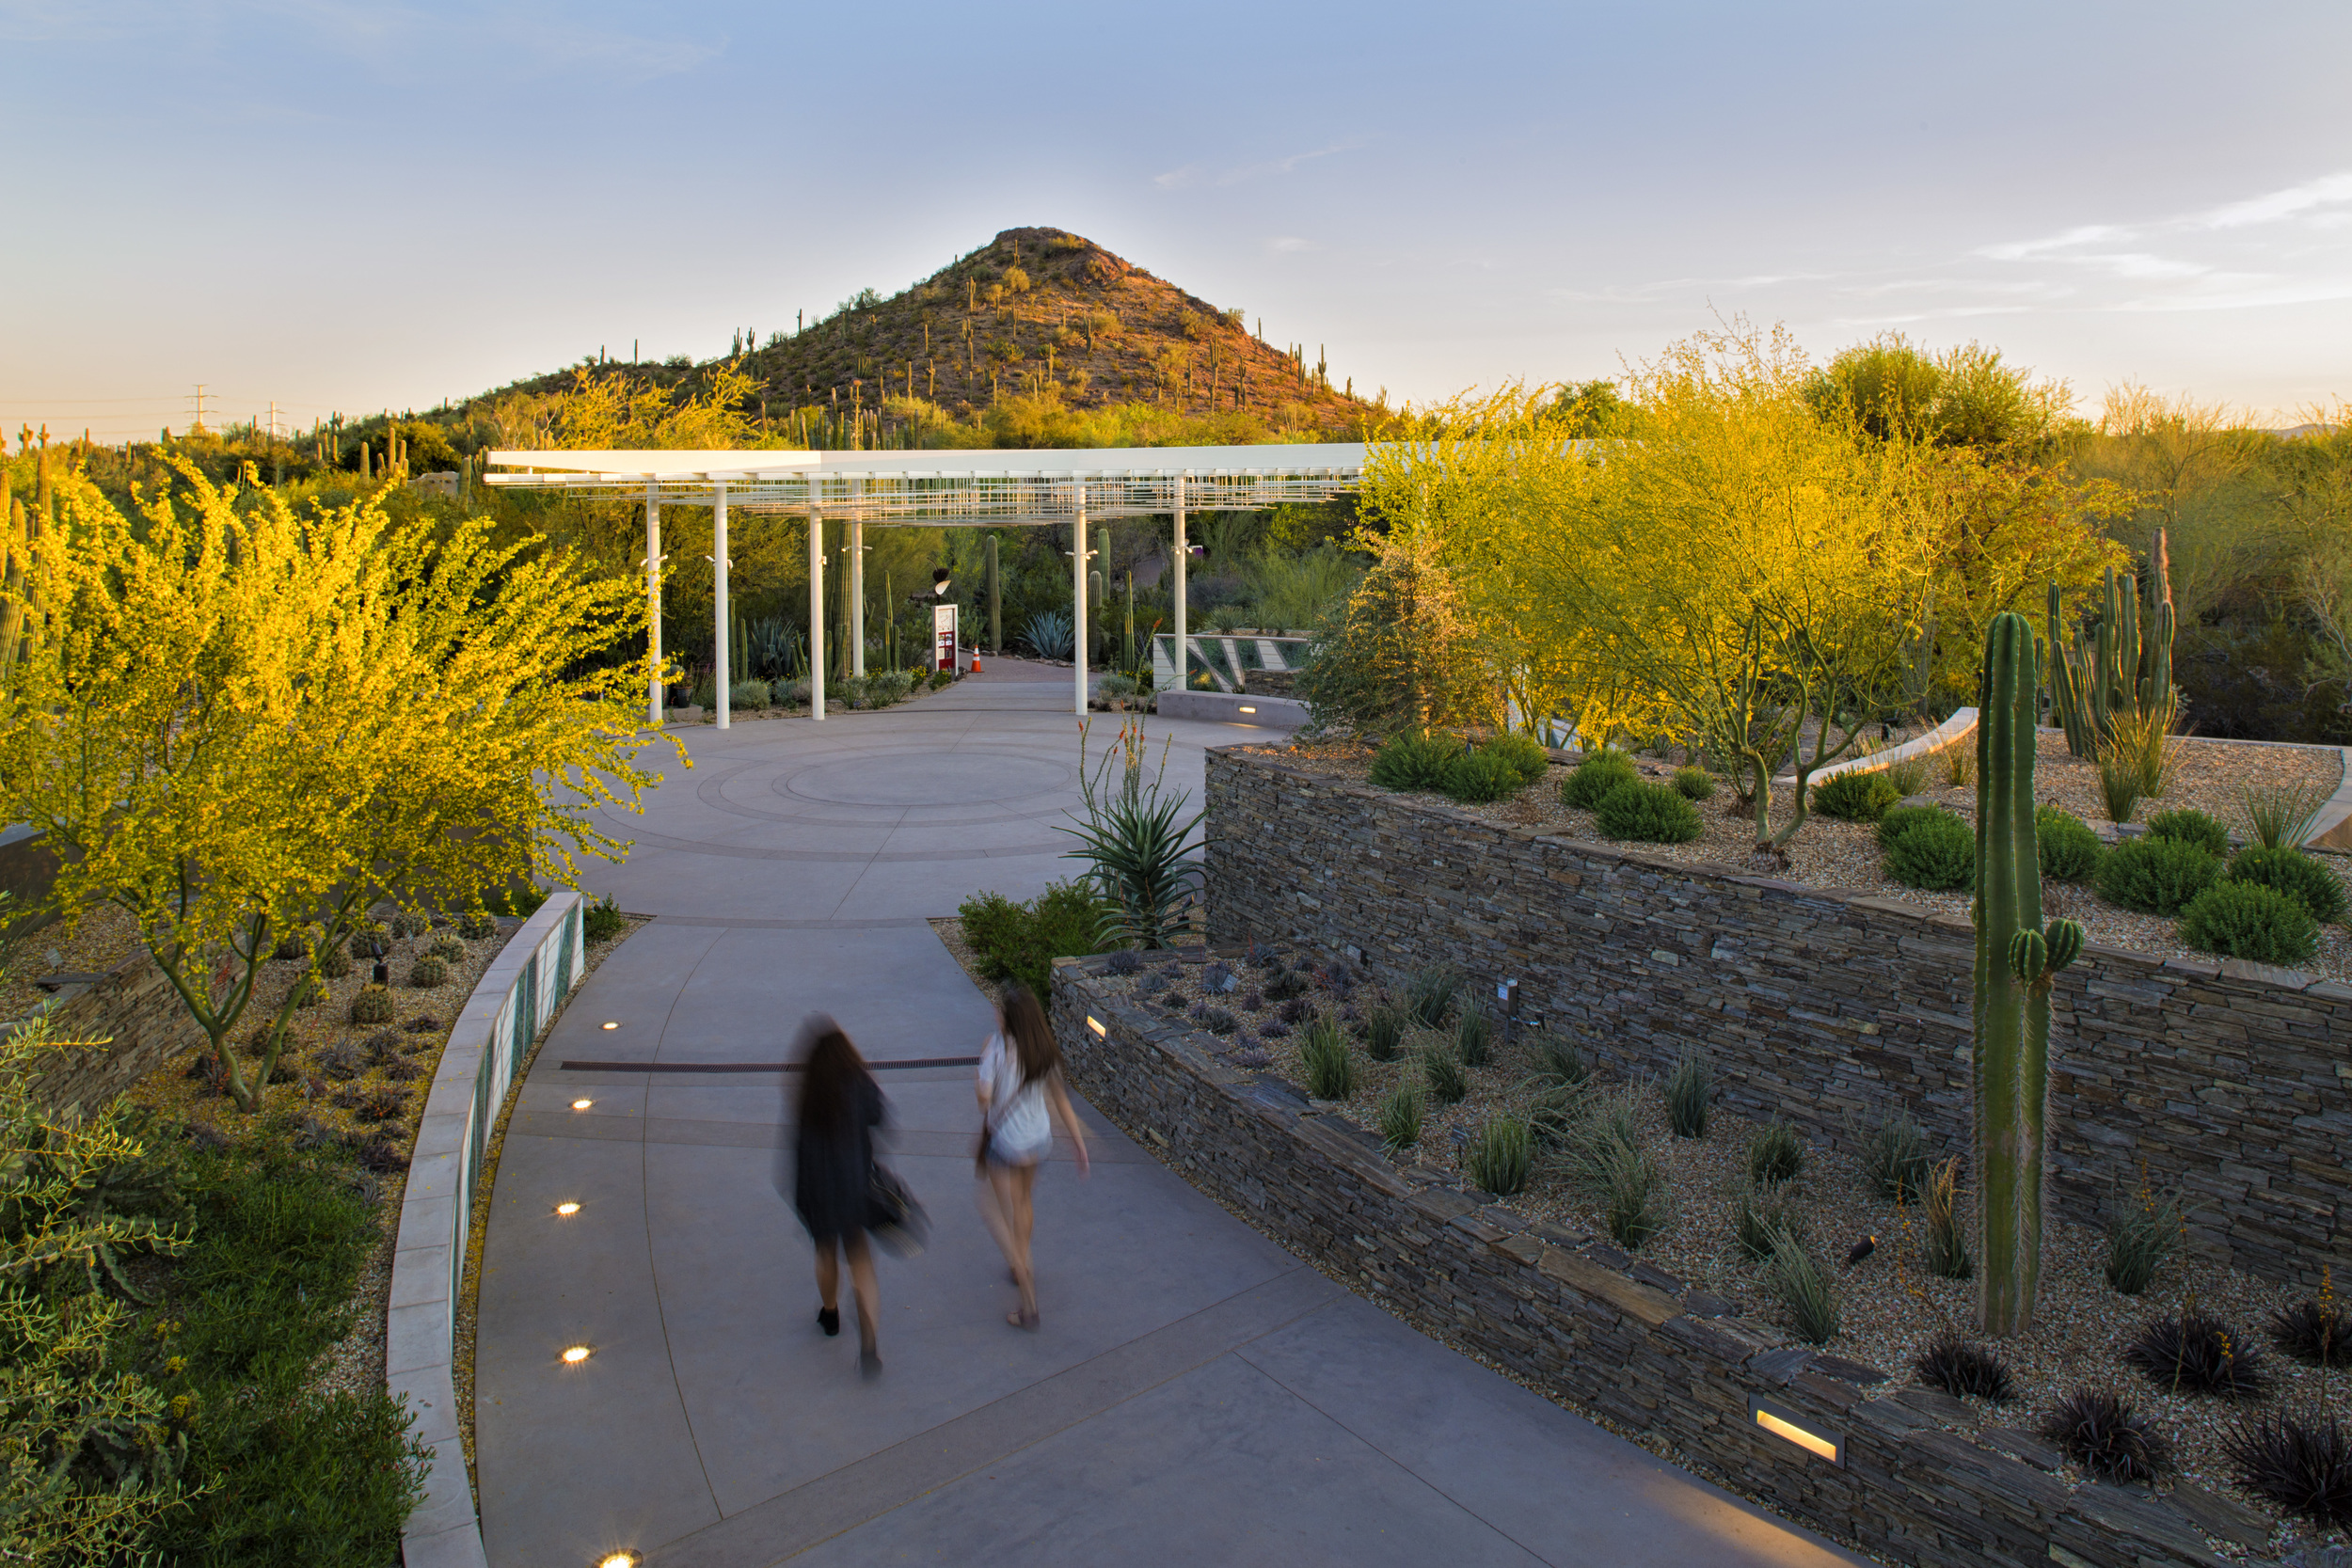 Desert Portal and Terrace Garden